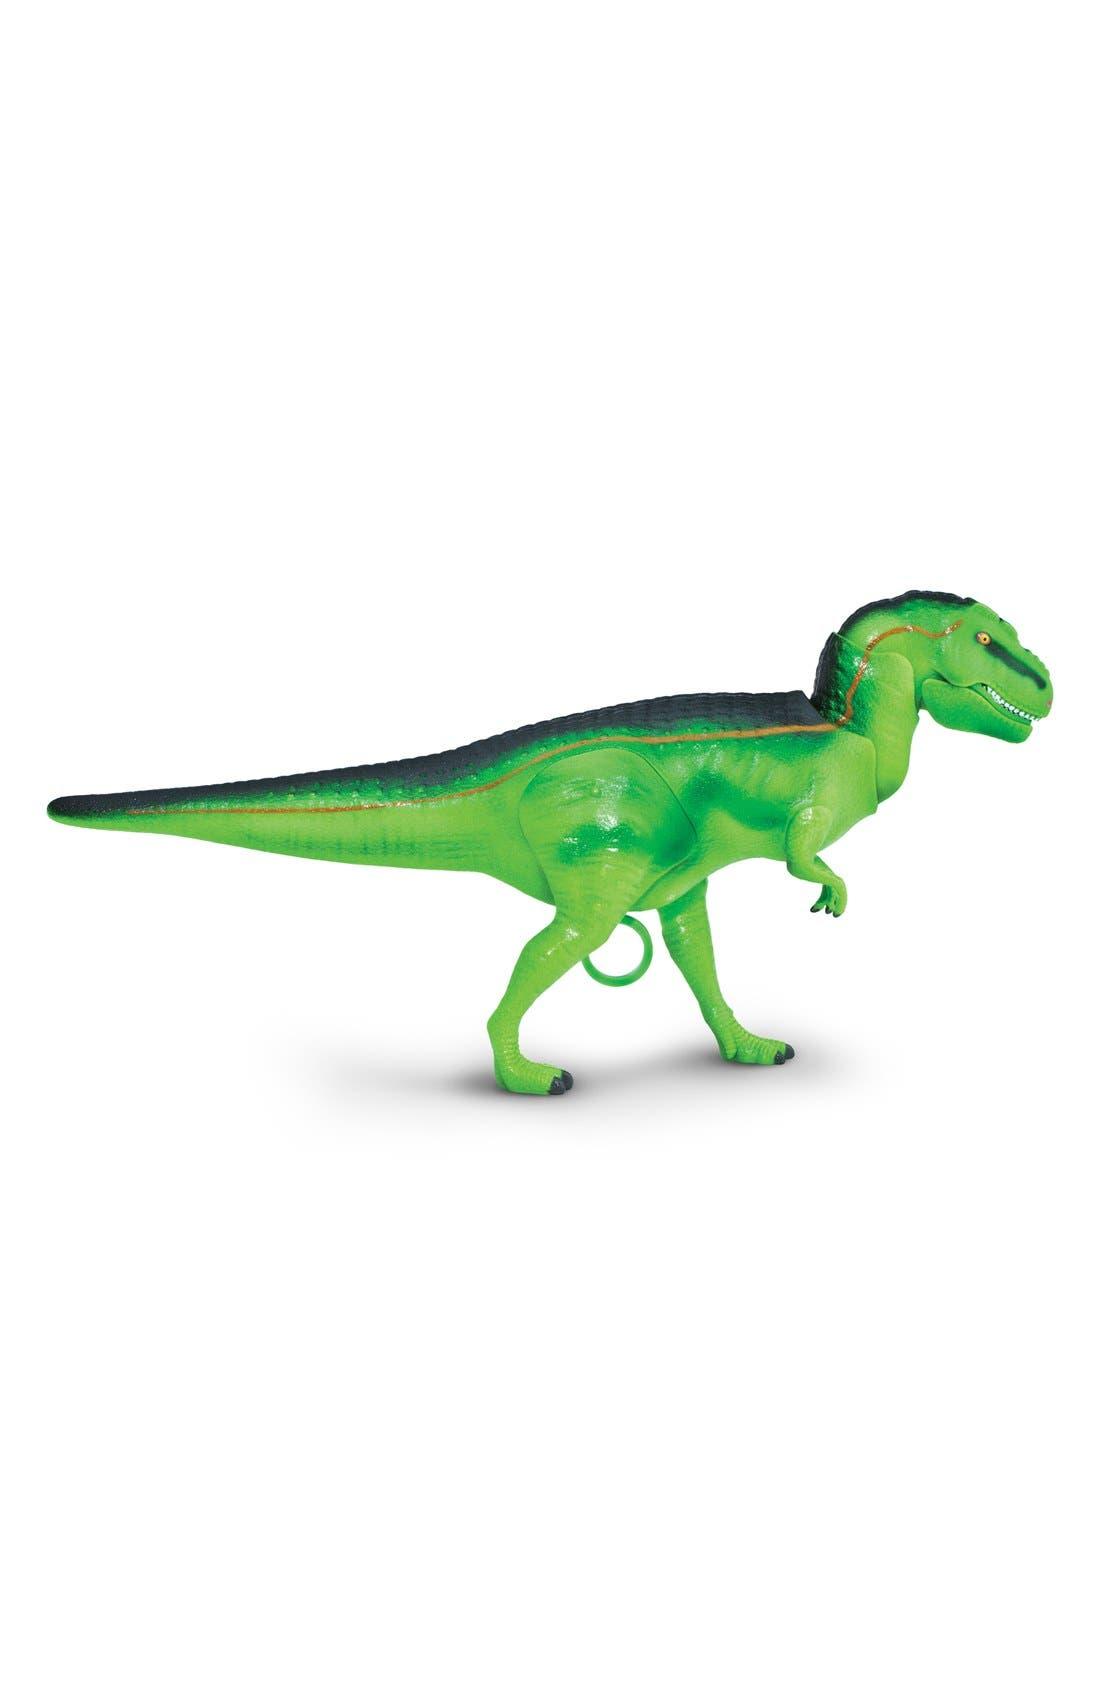 SAFARI LTD. Jaw Snapping Tyrannosaurus Rex Dinosaur Figurine